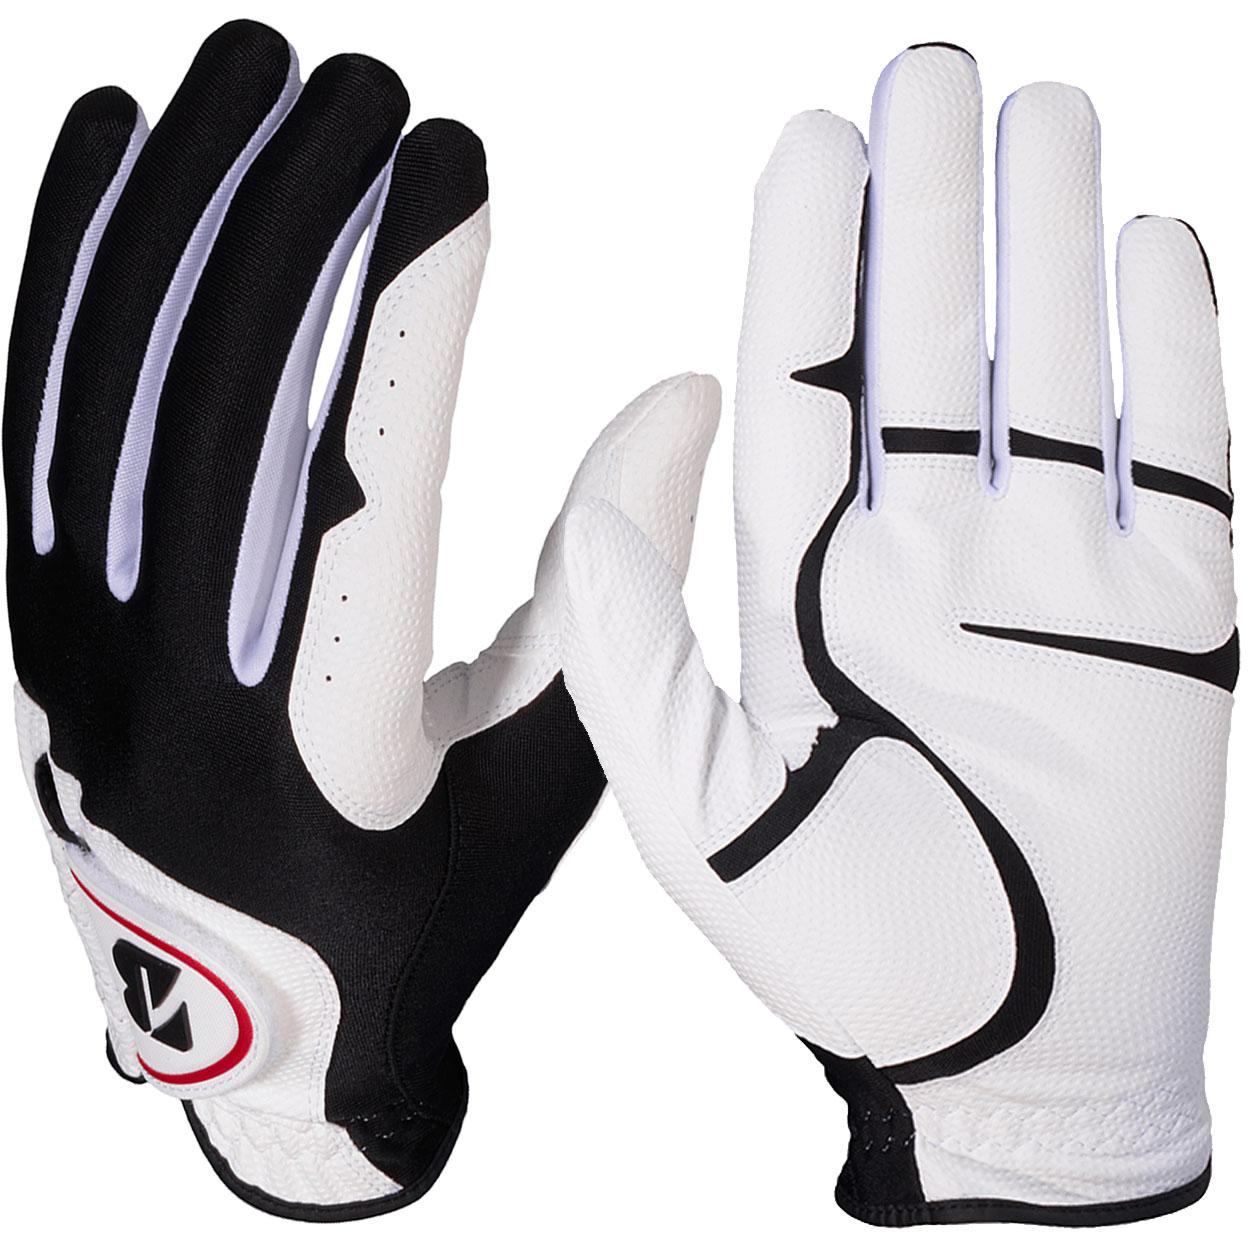 Bridgestone-Men-039-s-EZ-Fit-White-Golf-Gloves-3-Pack-NEW thumbnail 5